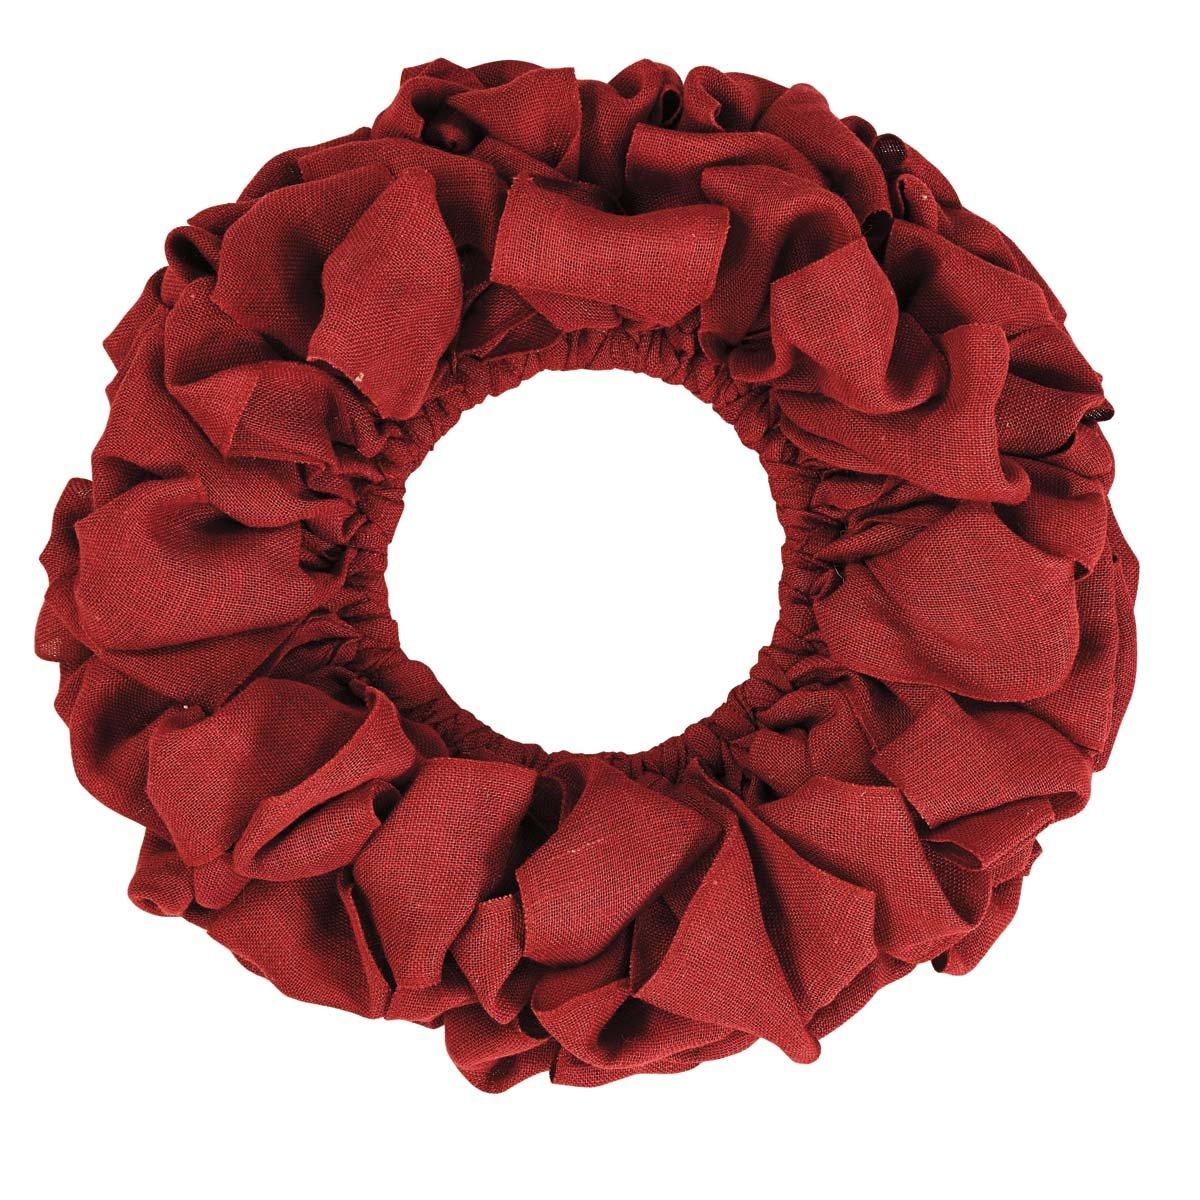 VHC Brands Christmas Holiday Decor - Burlap Round Wreath, Red, 20'' Diameter